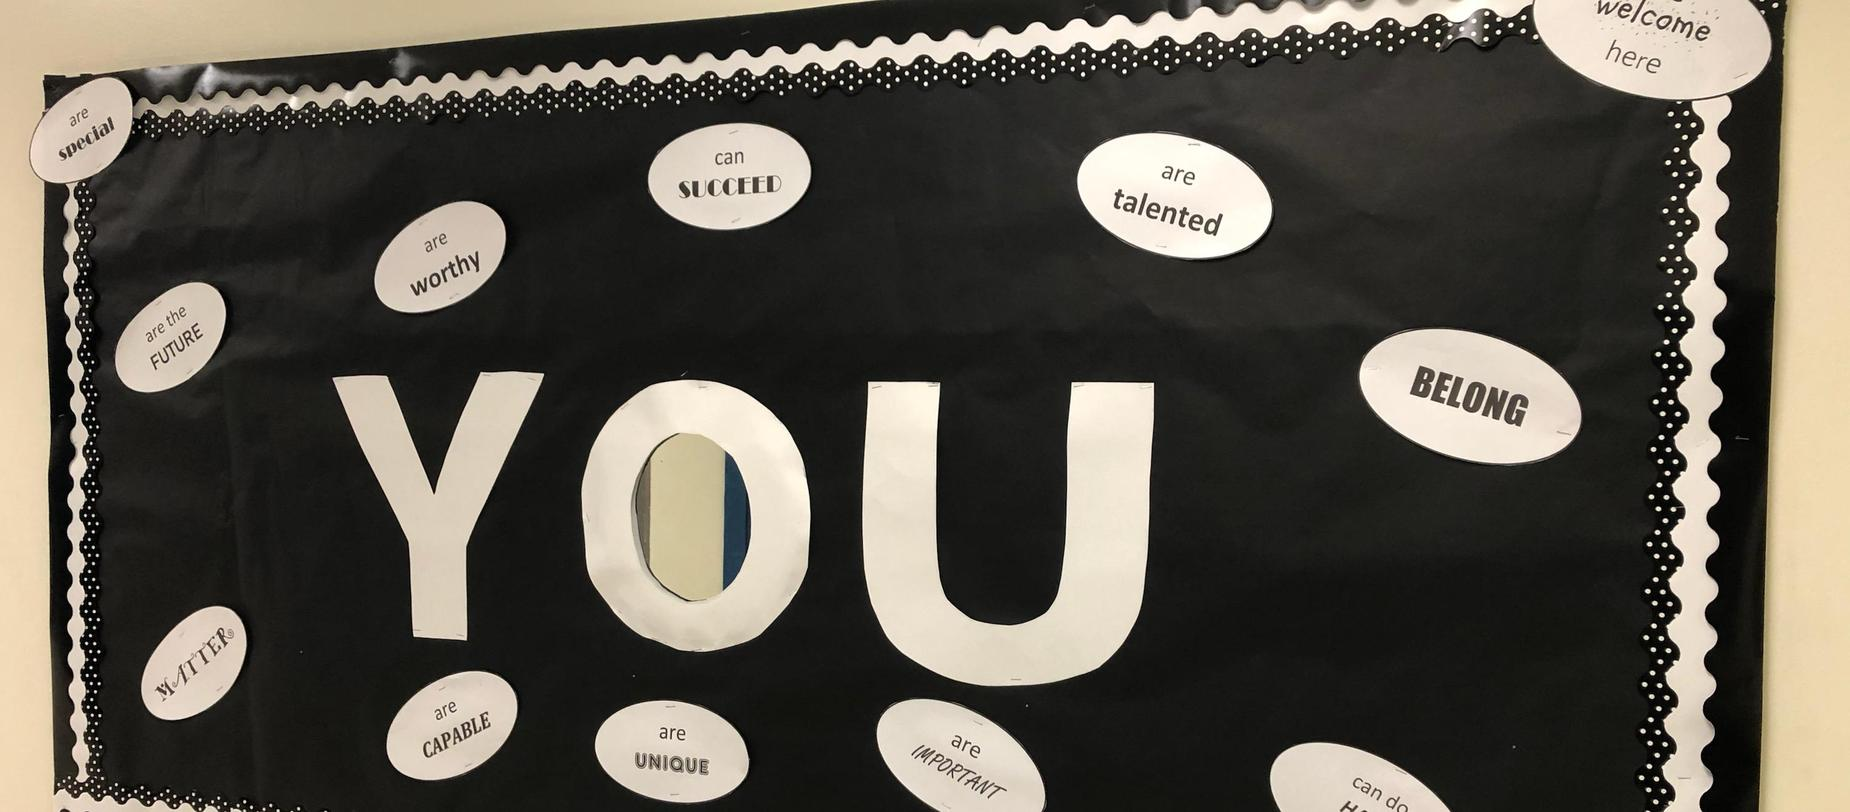 You are Bulletin Board